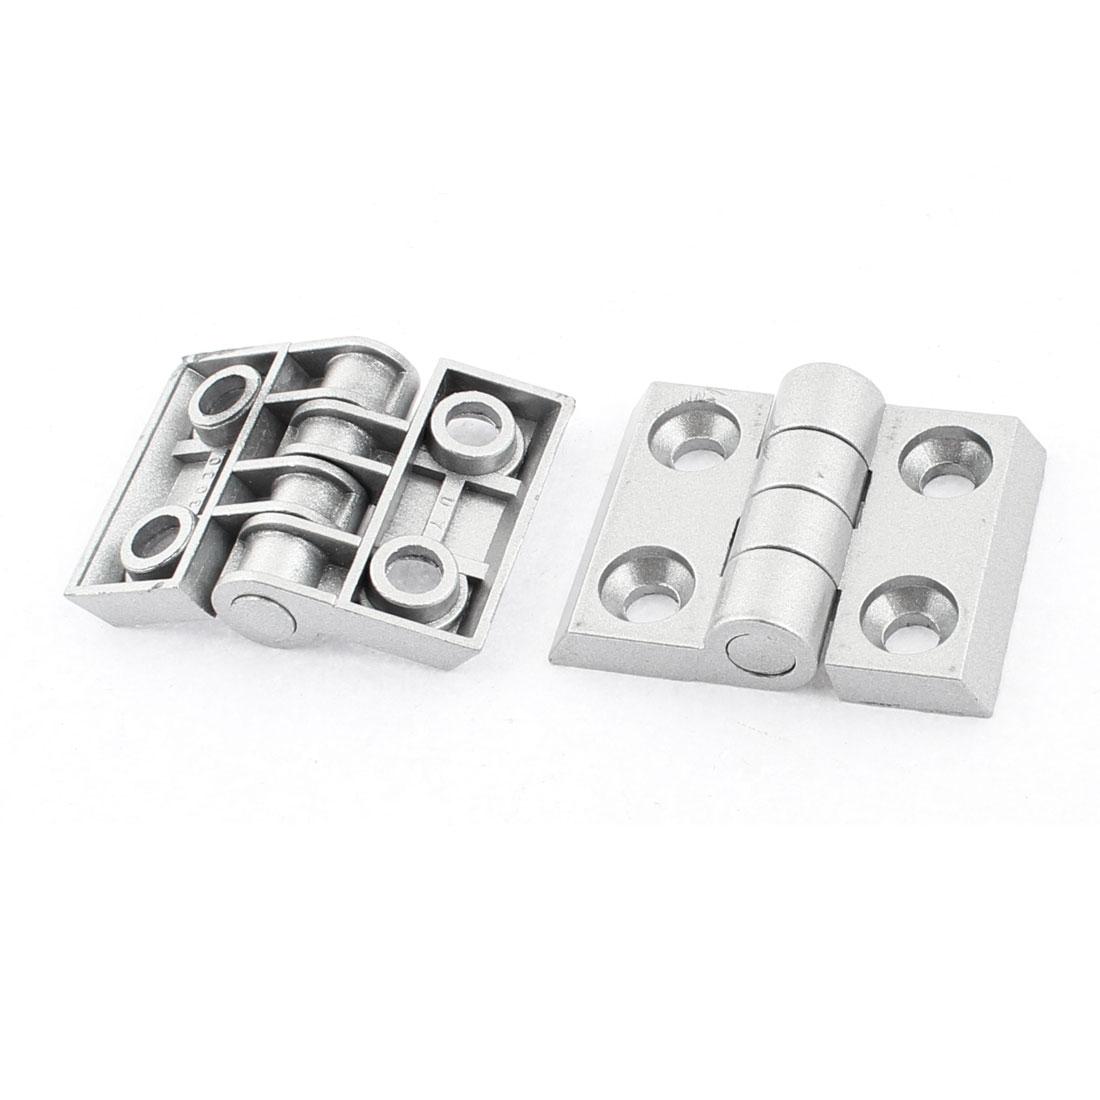 53mm x 40mm x 13mm Cupboard Cabinet Door Metal Butt Hinge Silver Tone 2pcs